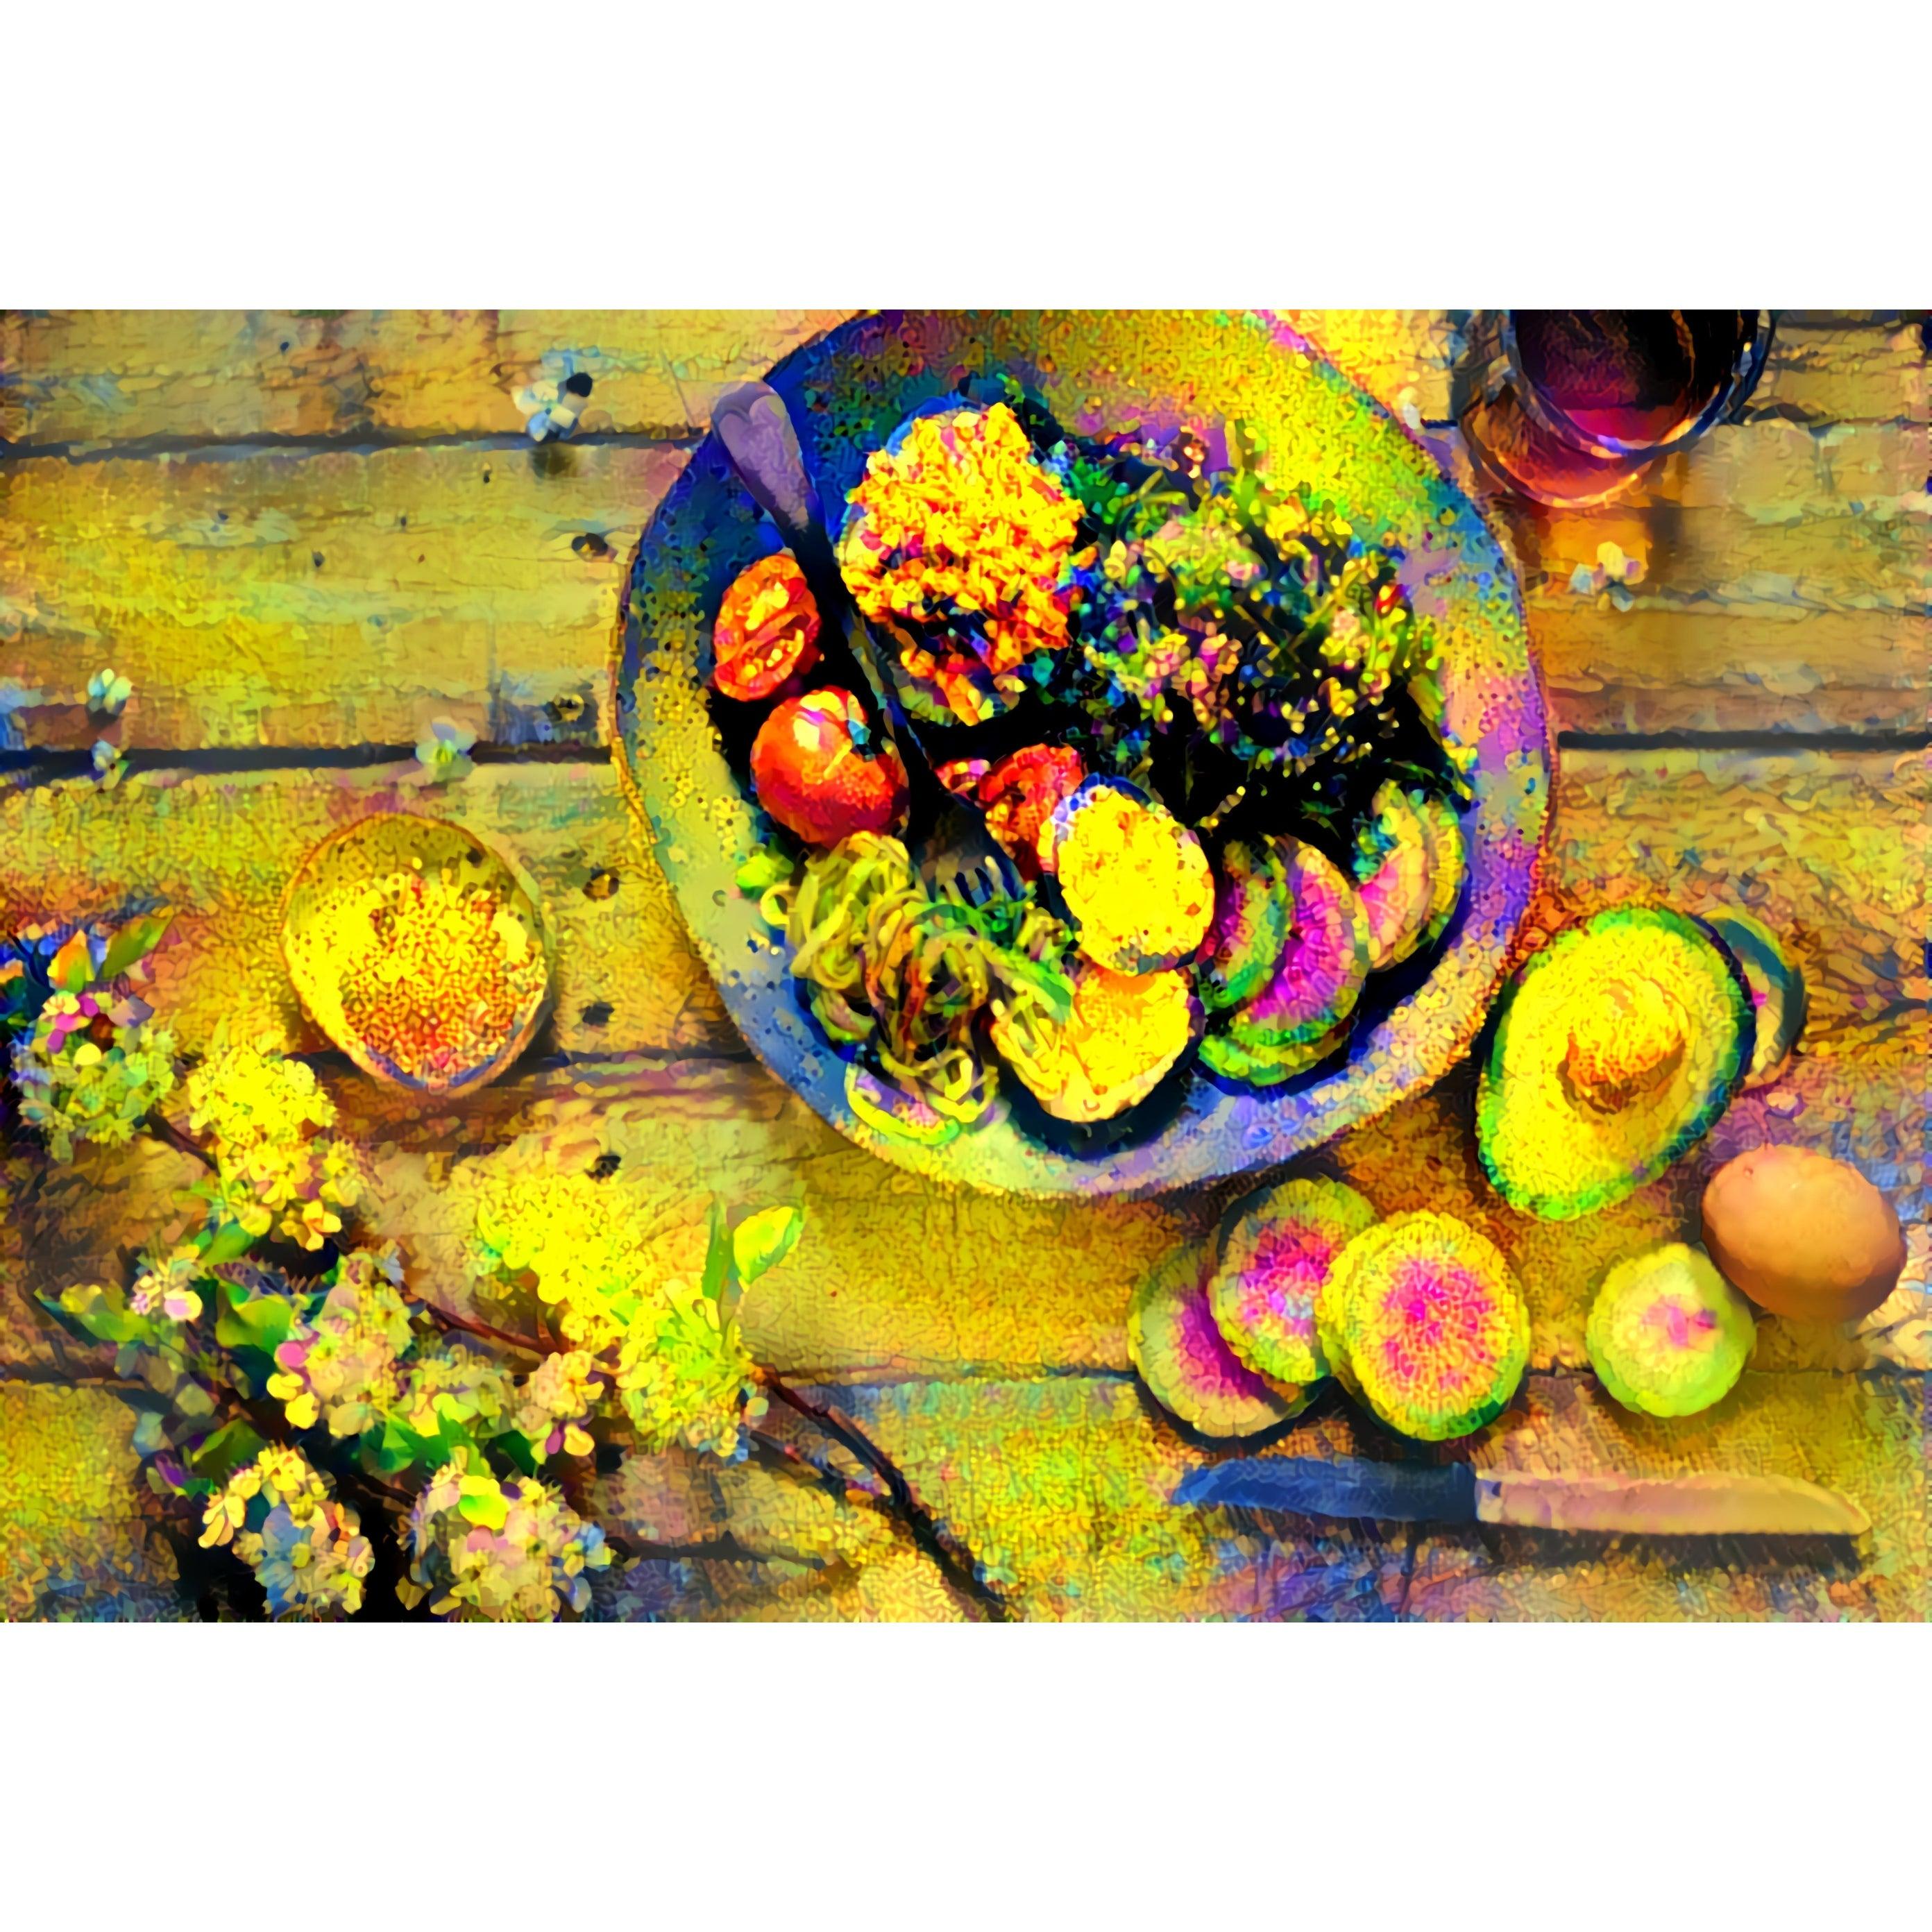 Shop Food Glass Tumblr Art Print Wall Artwork Decor Overstock